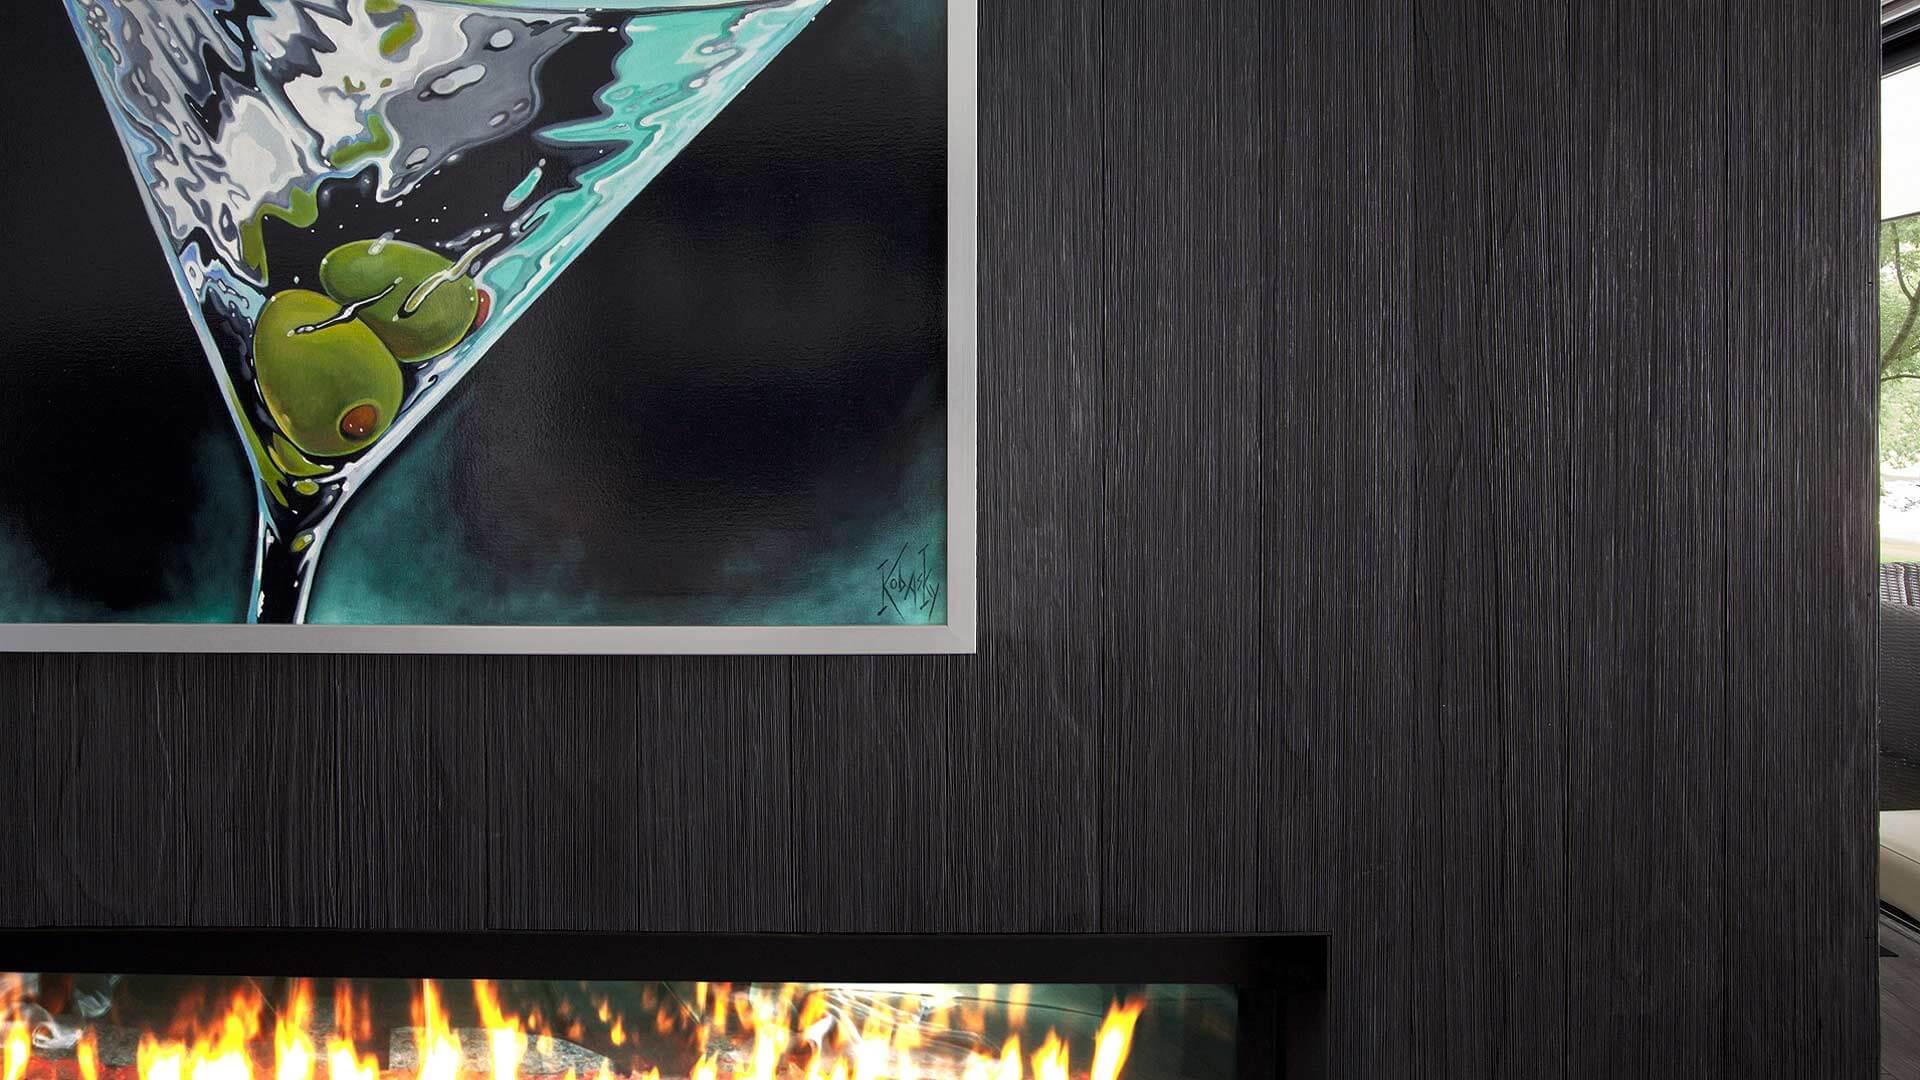 Charred Wood Fireplace Surround, Gas Fireplace, and Colorful Large Format Artwork (Martini Glass Inspired) - Lakeside Modern Cottage (H-LODGE) - Unionville, Indiana, Lake Lemon